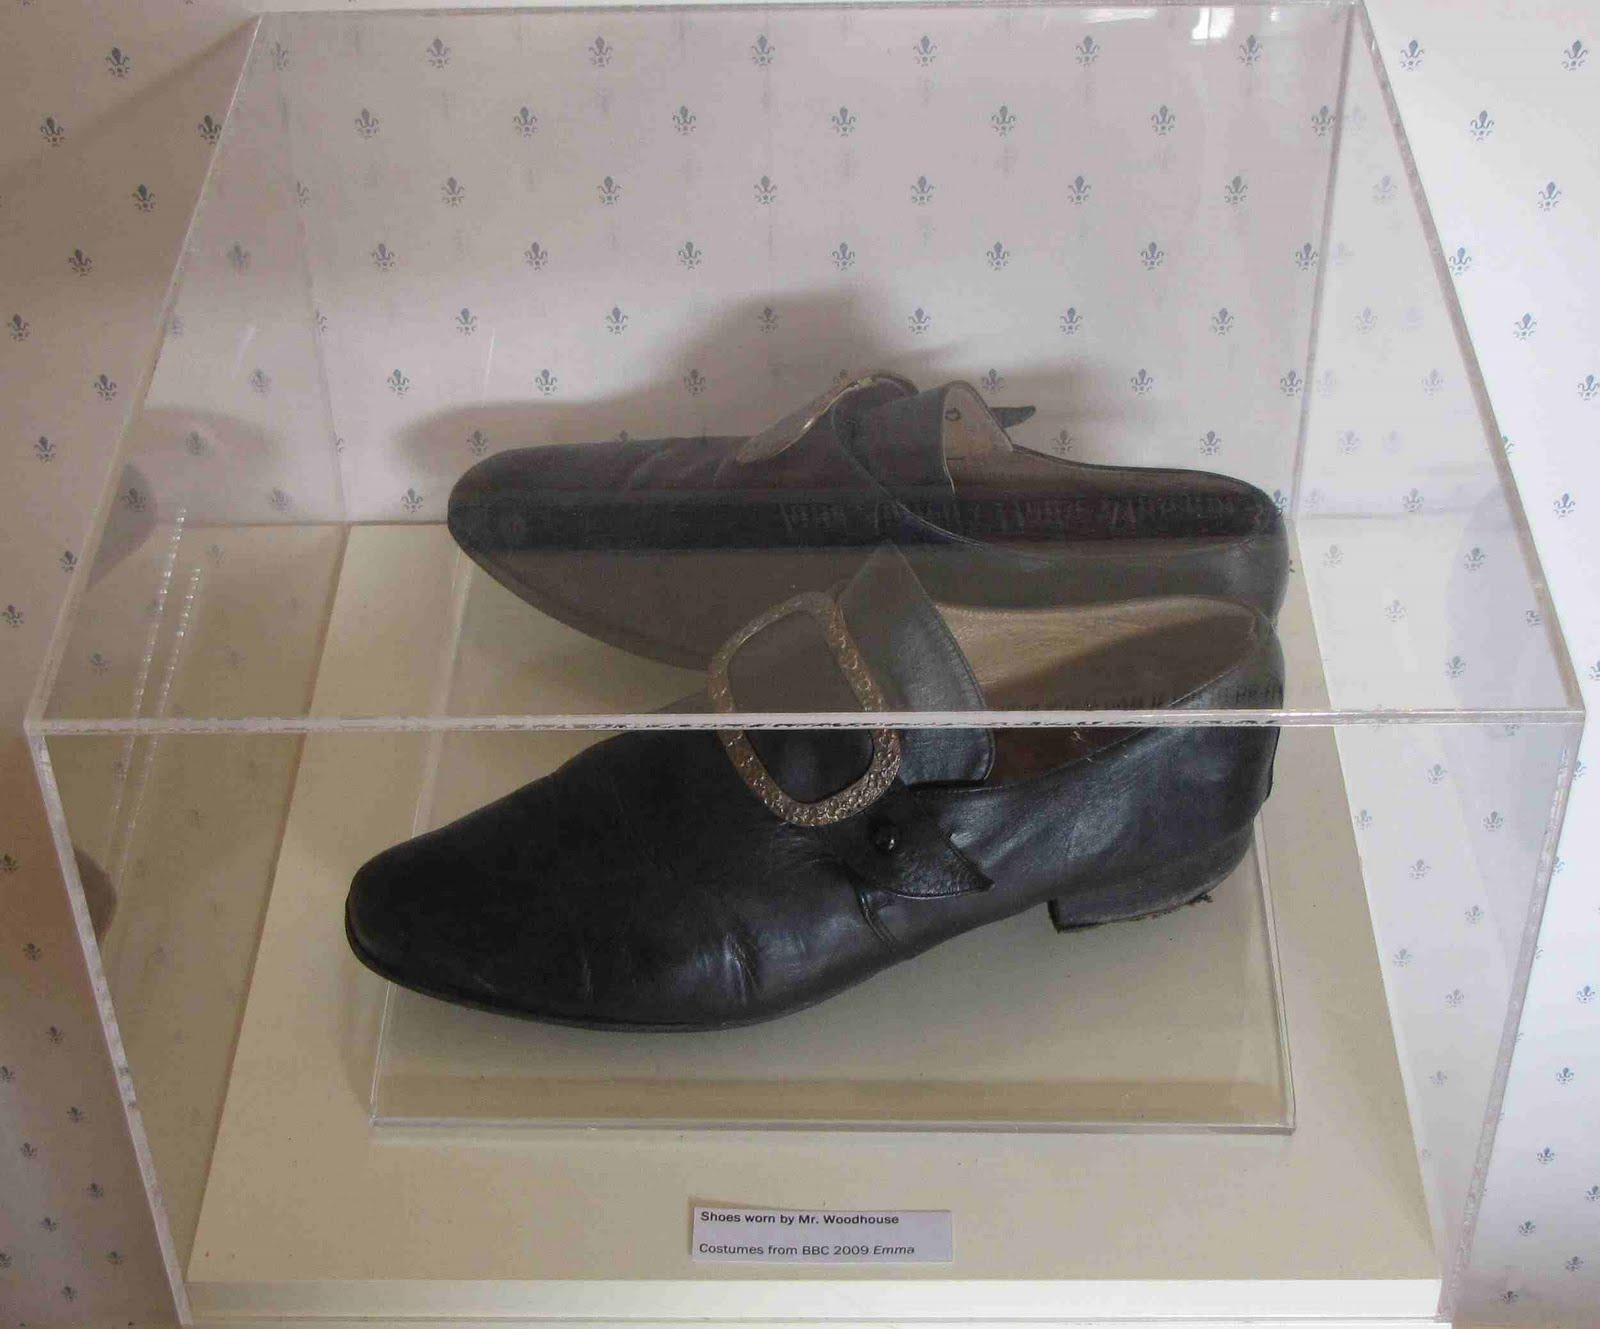 http://2.bp.blogspot.com/_BQWftIXHVpg/S9WkXluYP5I/AAAAAAAAAFY/jE5Iqe5acUk/s1600/shoes.jpg